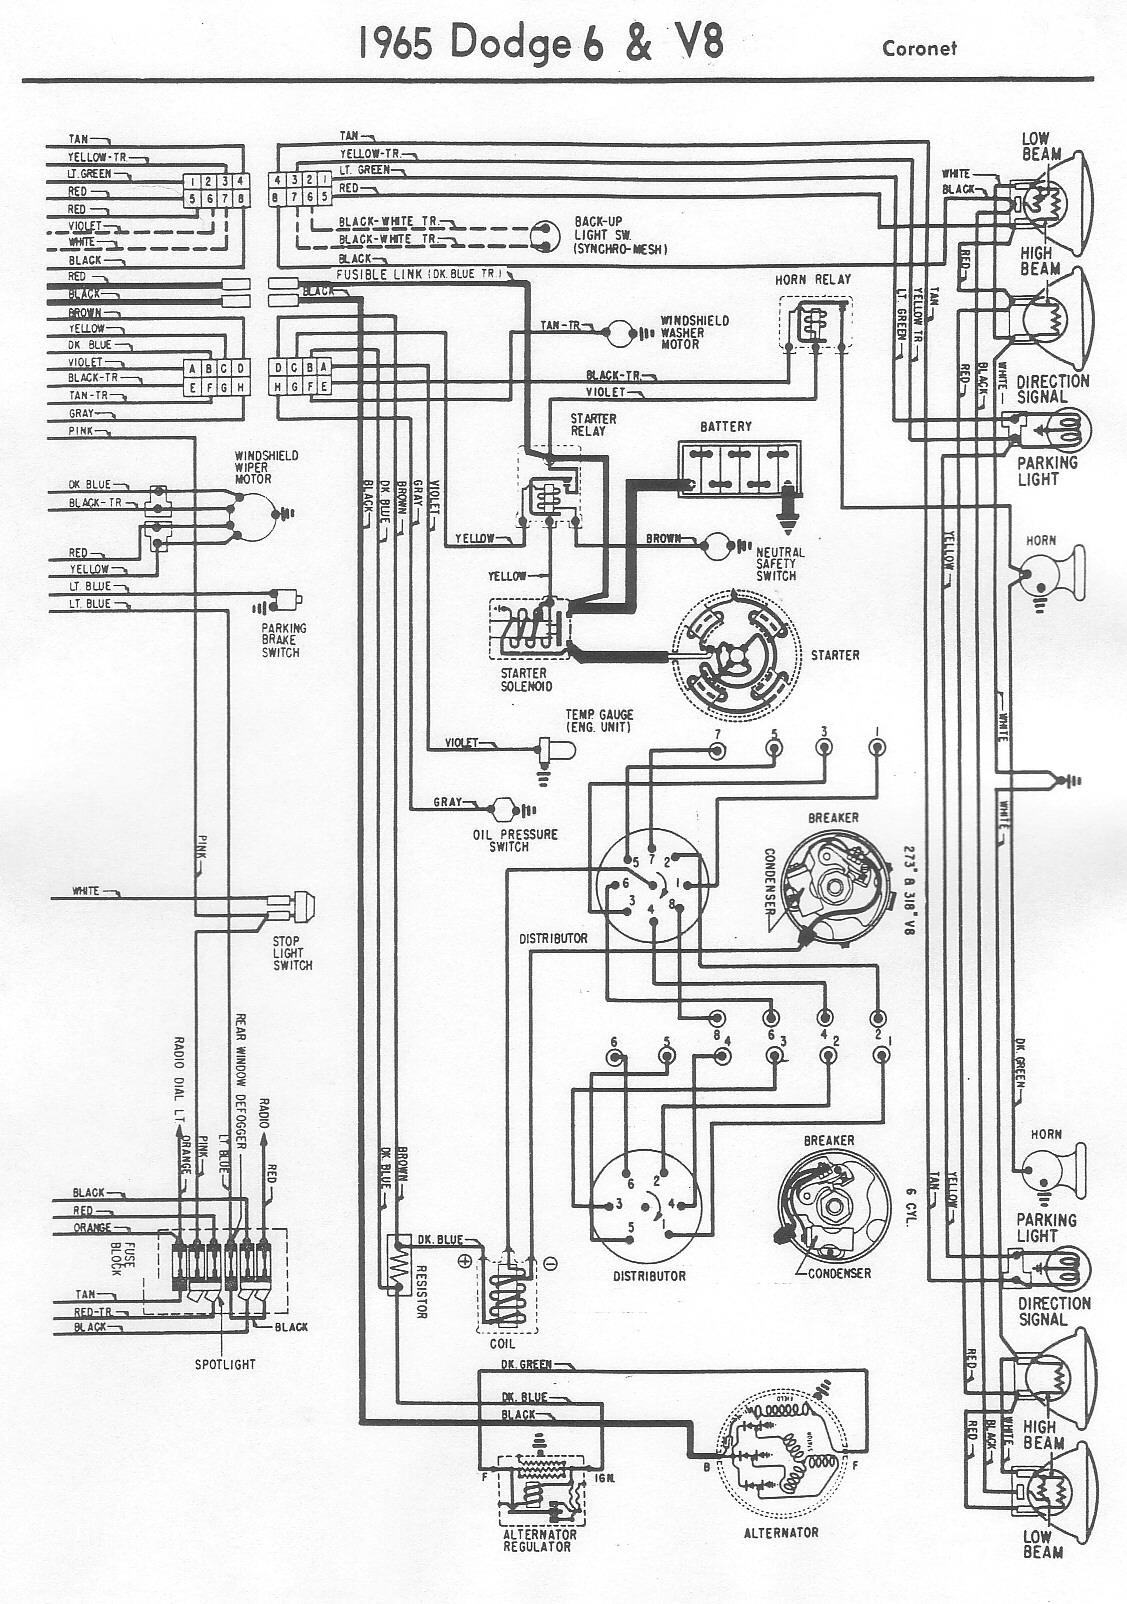 1965 coronet wiring harness wiring library u2022 1998 dodge truck wiring diagram 1960 dodge wiring [ 1127 x 1604 Pixel ]